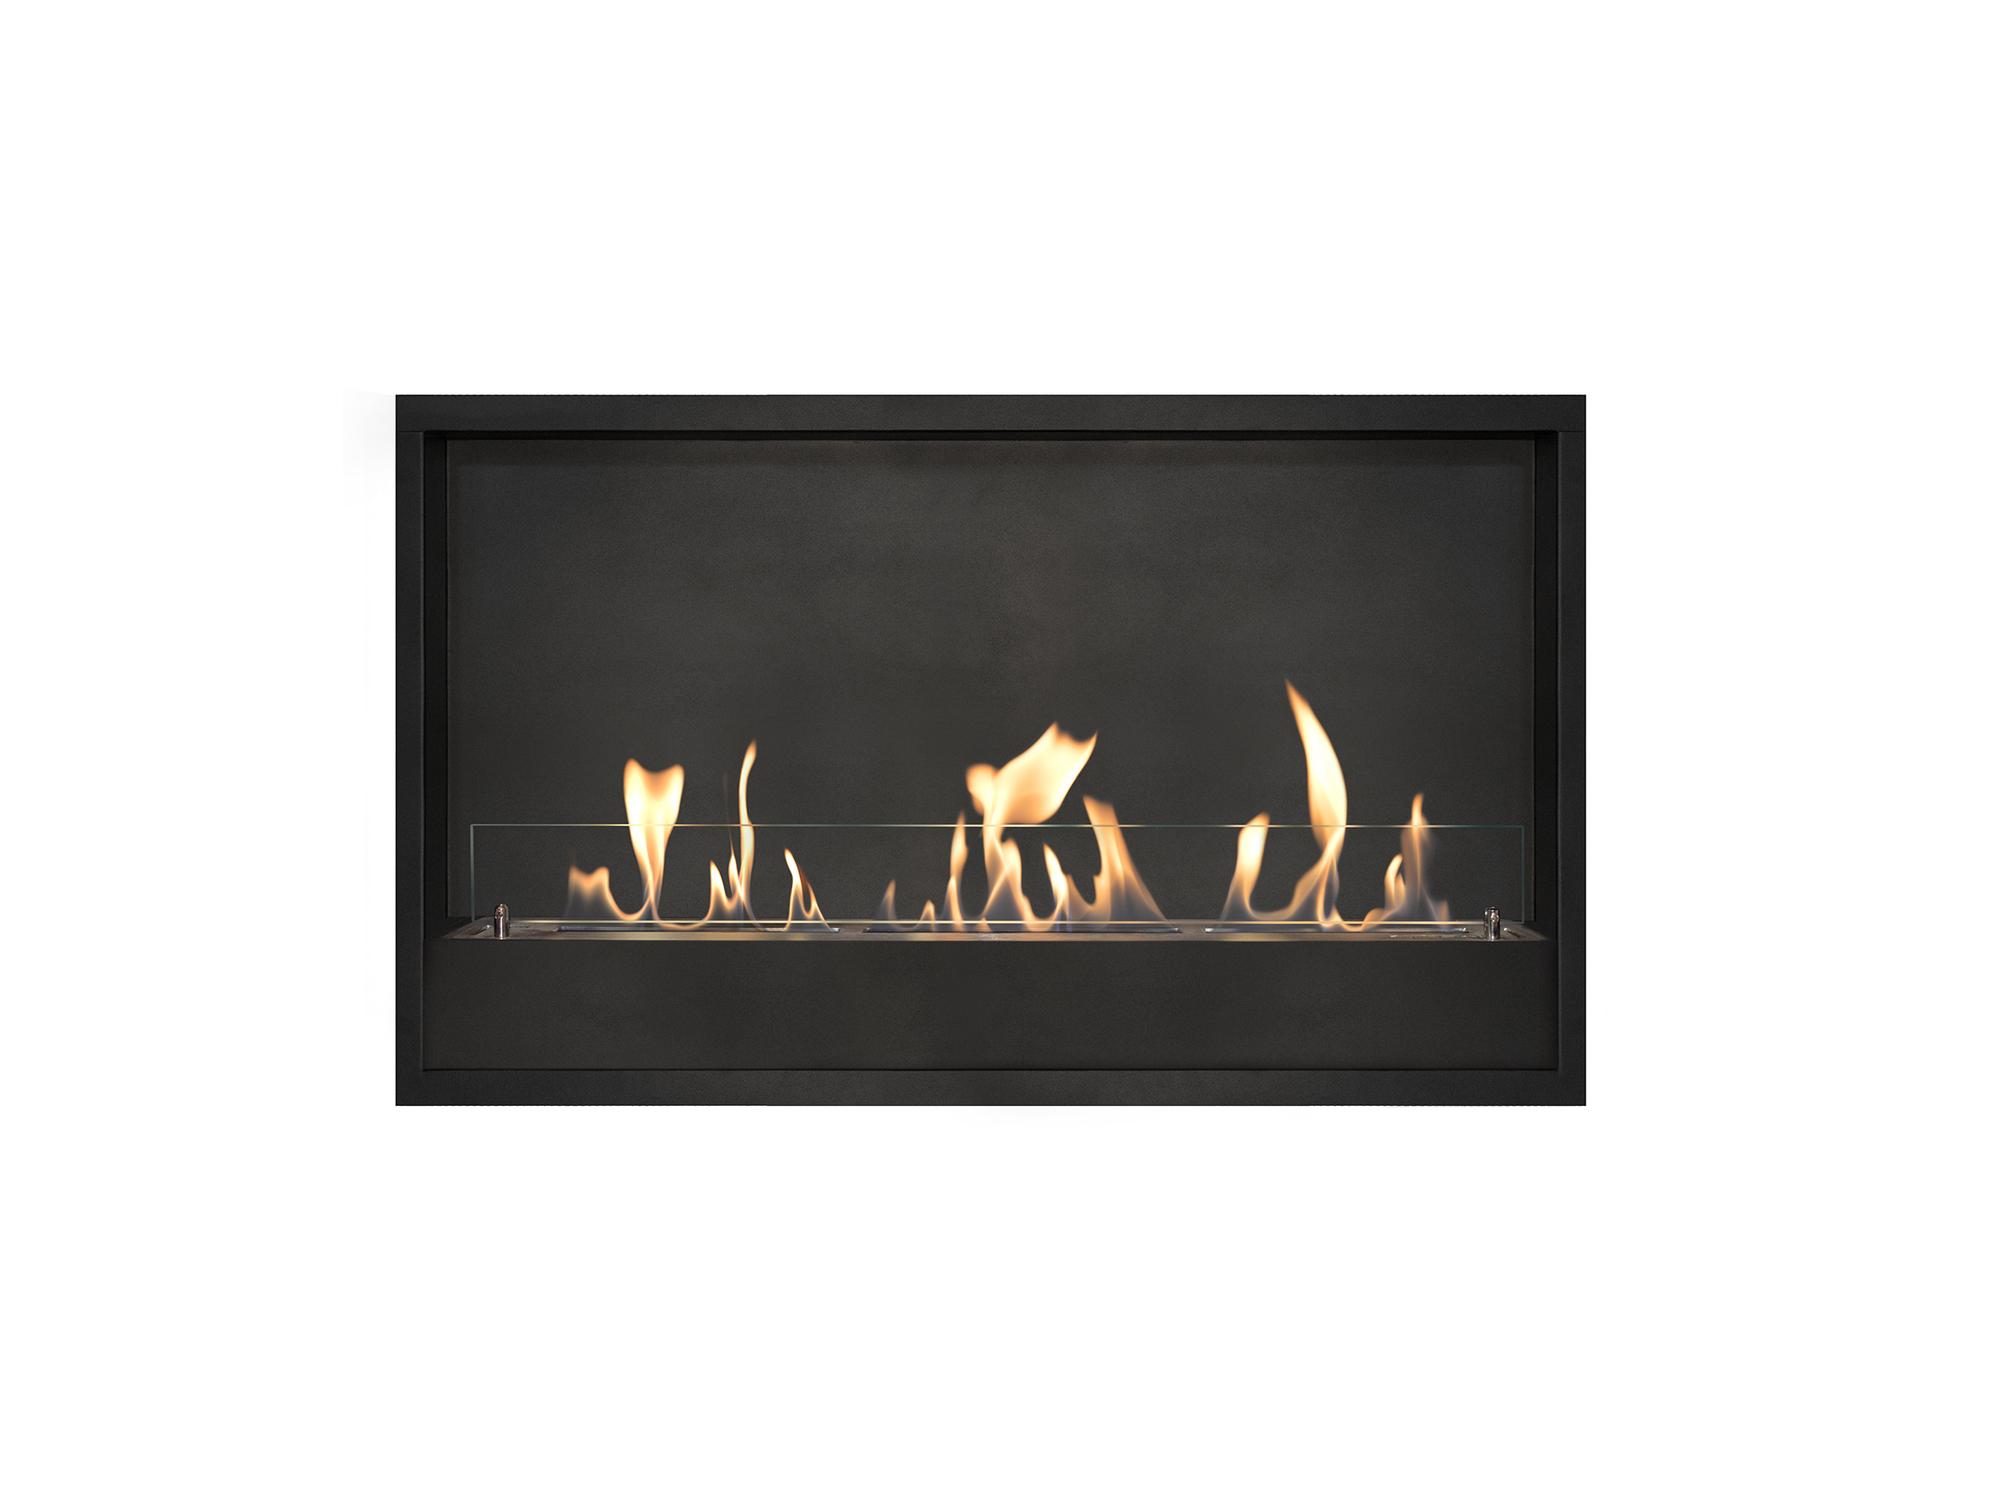 table top stand firebox burner free bio homcom decor home black portable ethanol fireplace